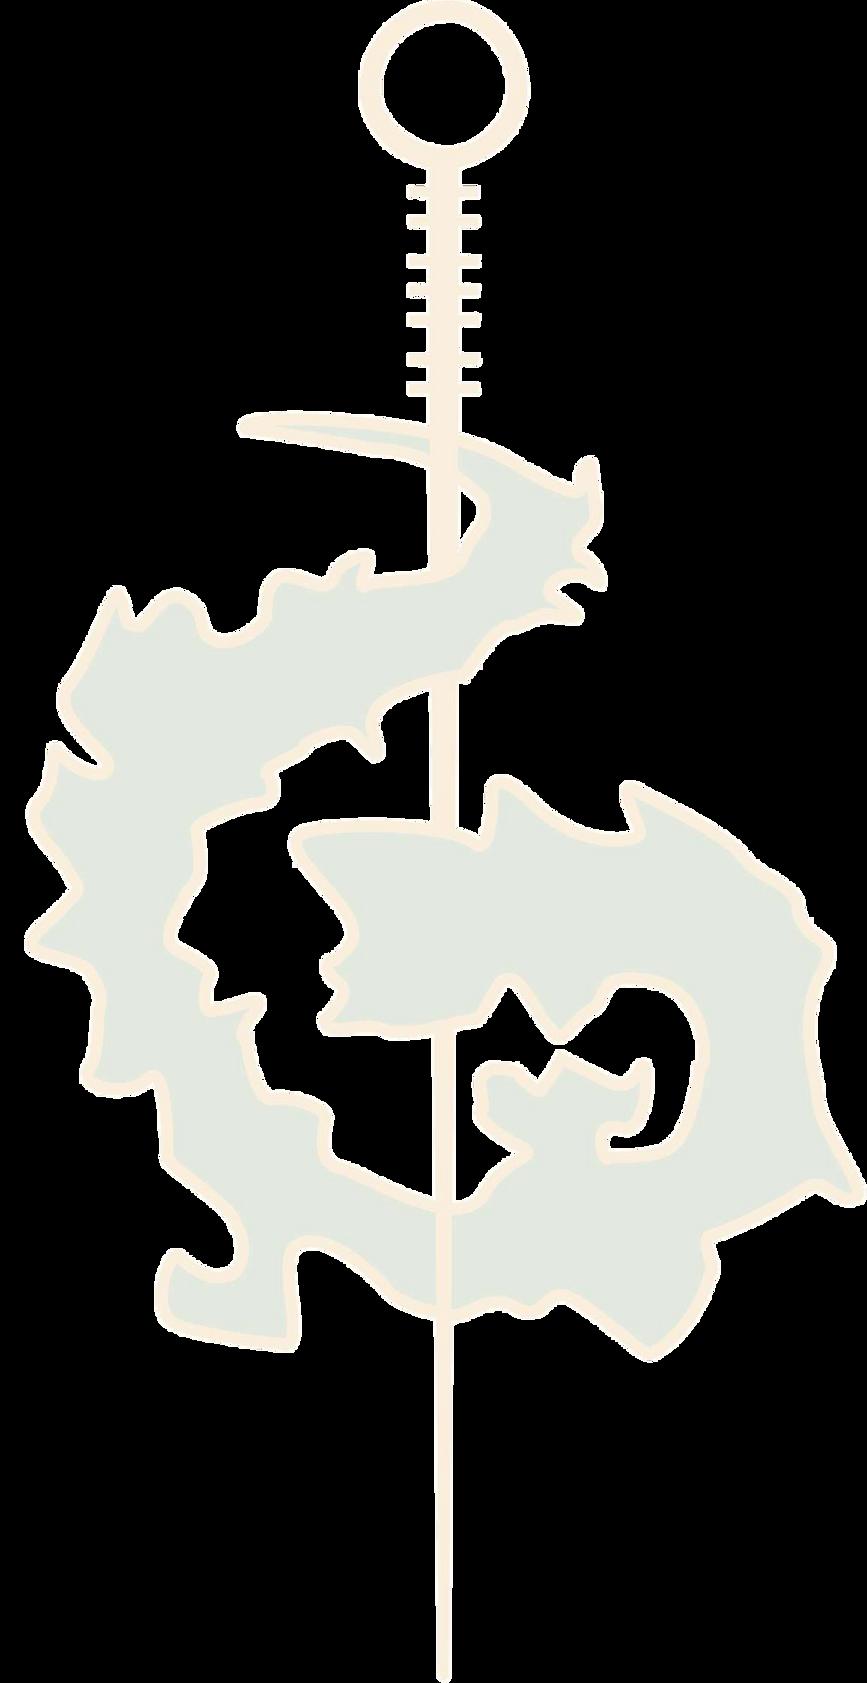 Acupuntura, quiropraxia, ipatinga, vale do aço, MG, Minas Gerais